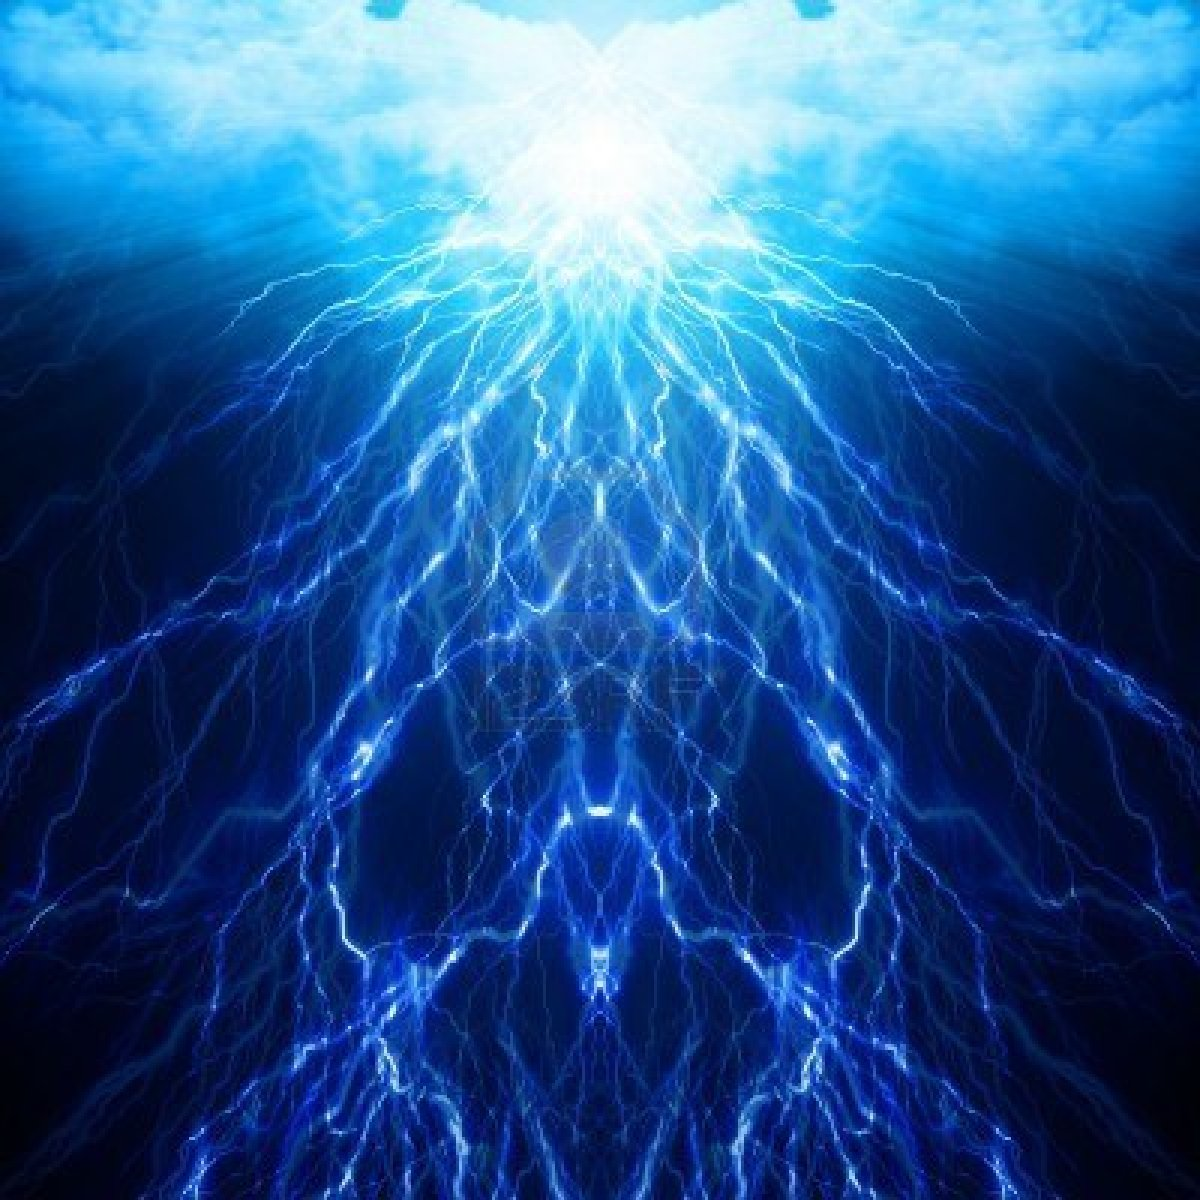 lightning wallpaper hd background desktop Car Pictures 1200x1200